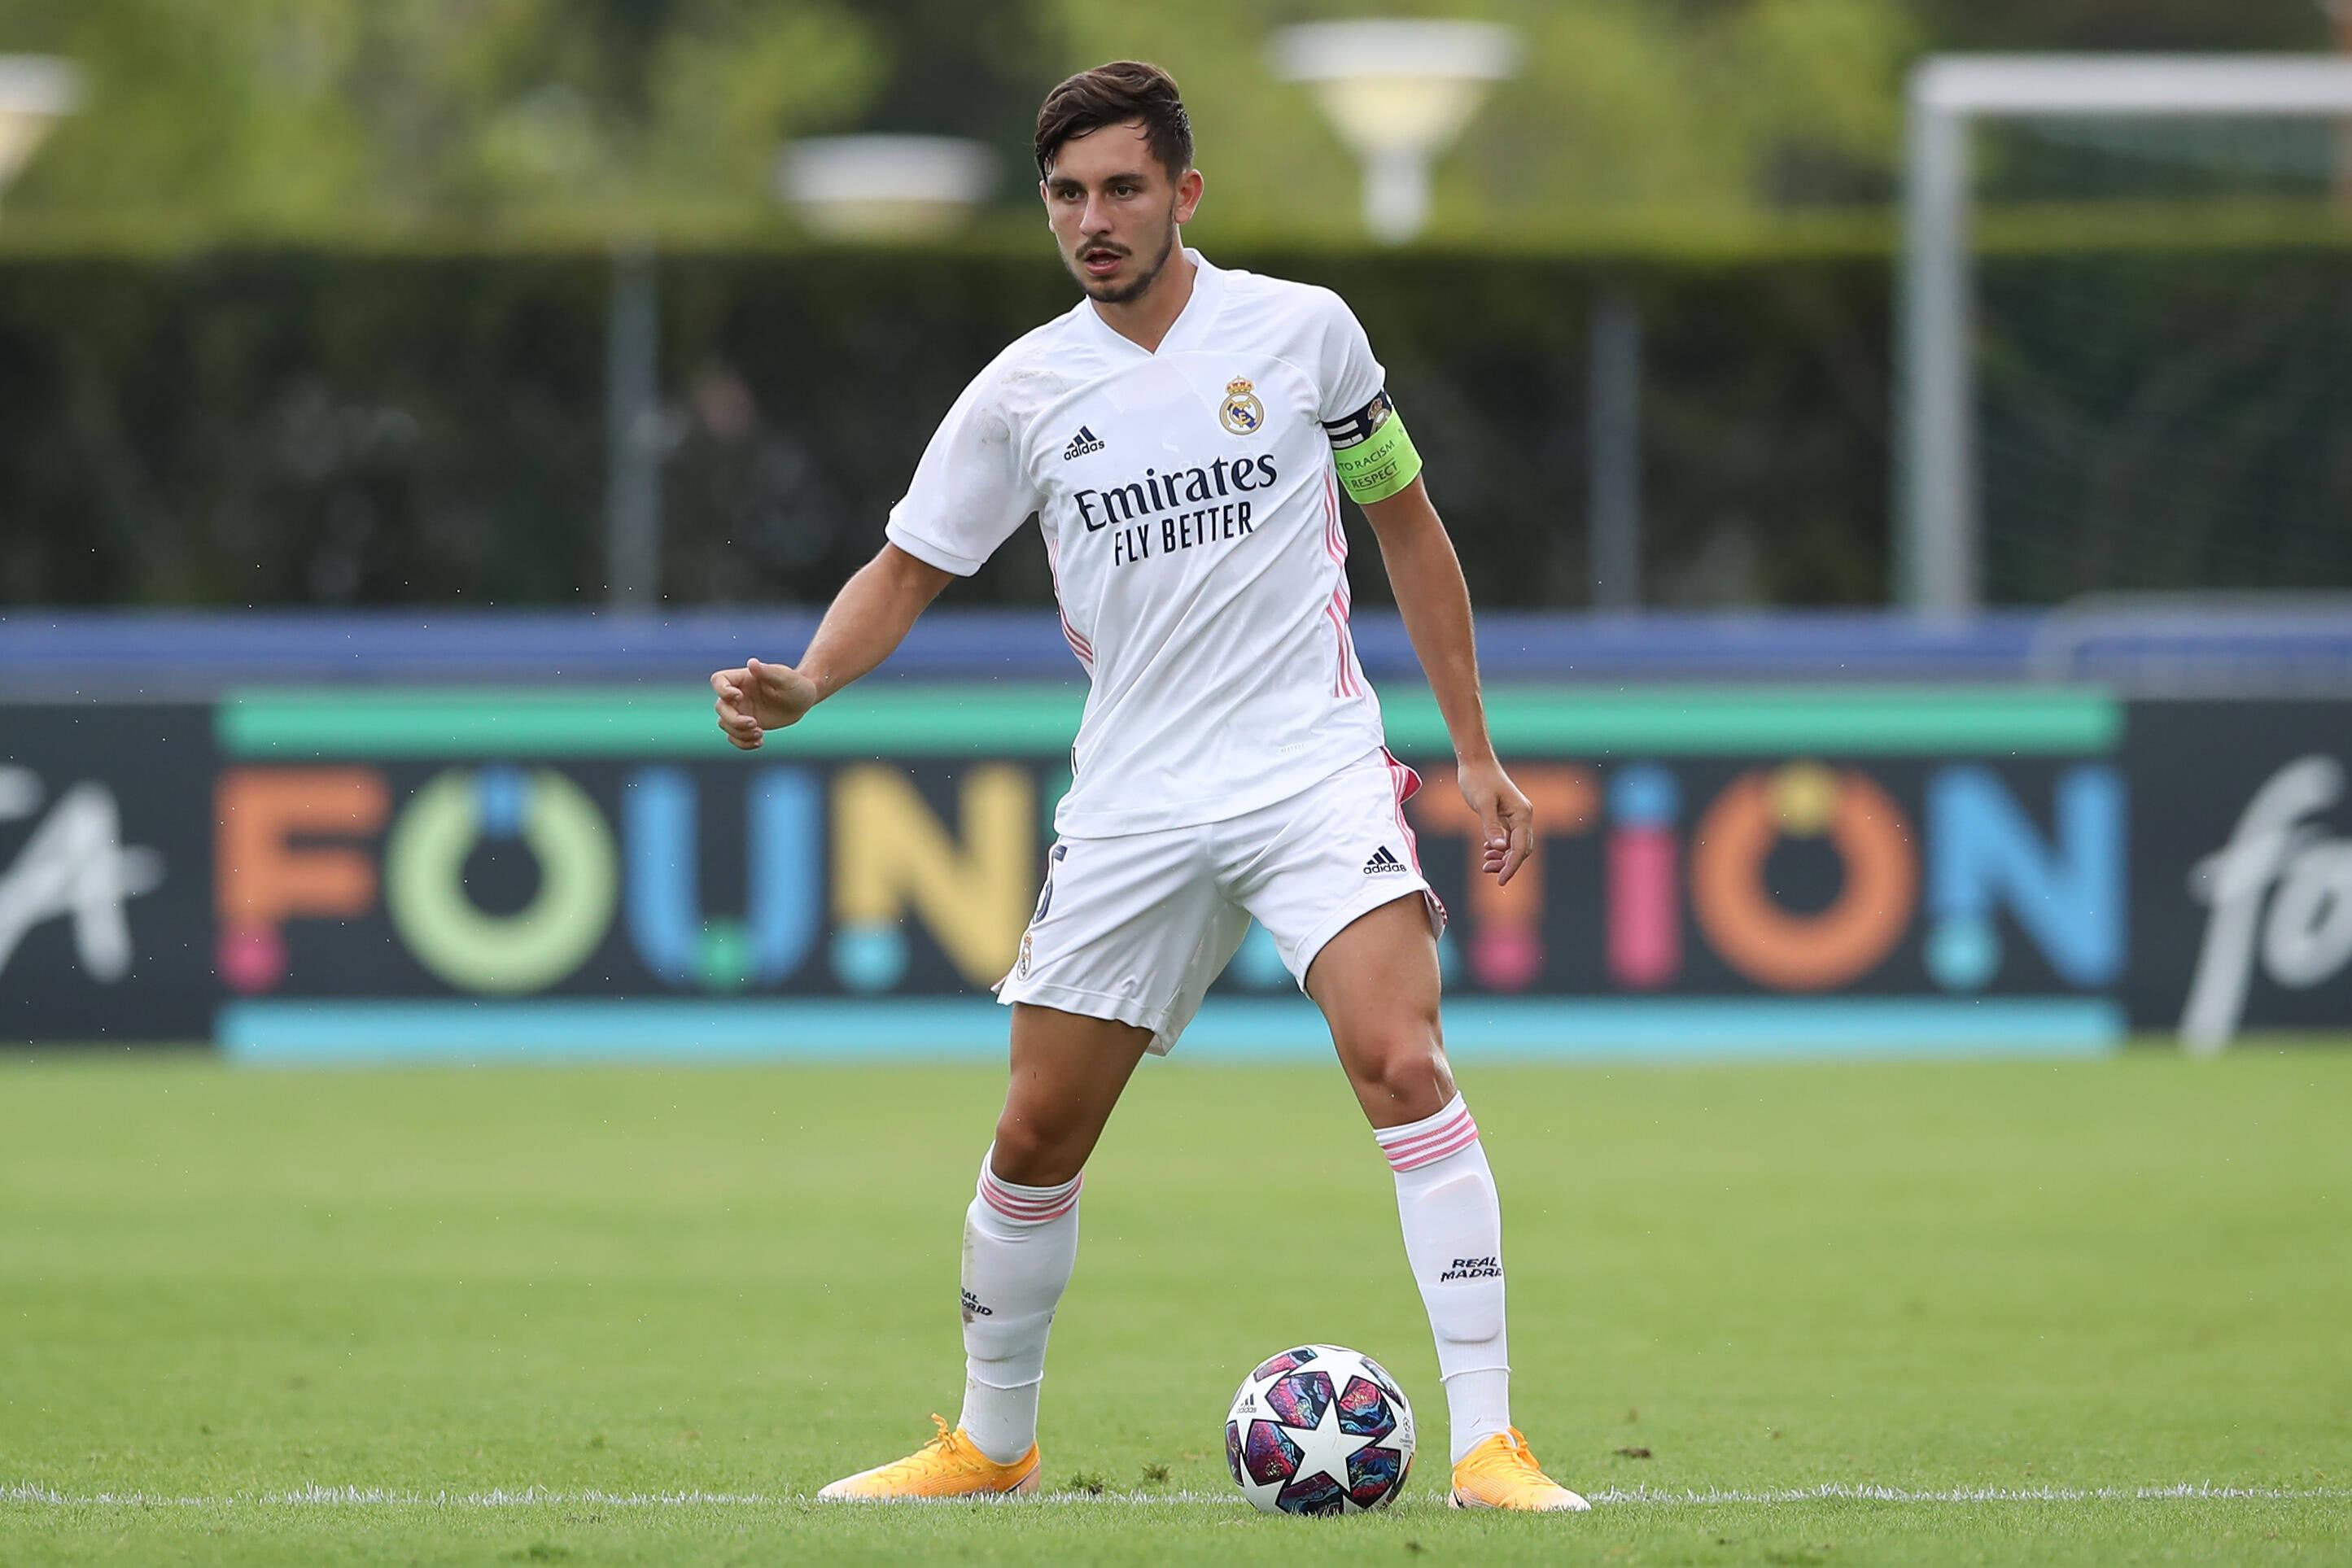 Real Madrid's Victor Chust set for Cadiz loan move